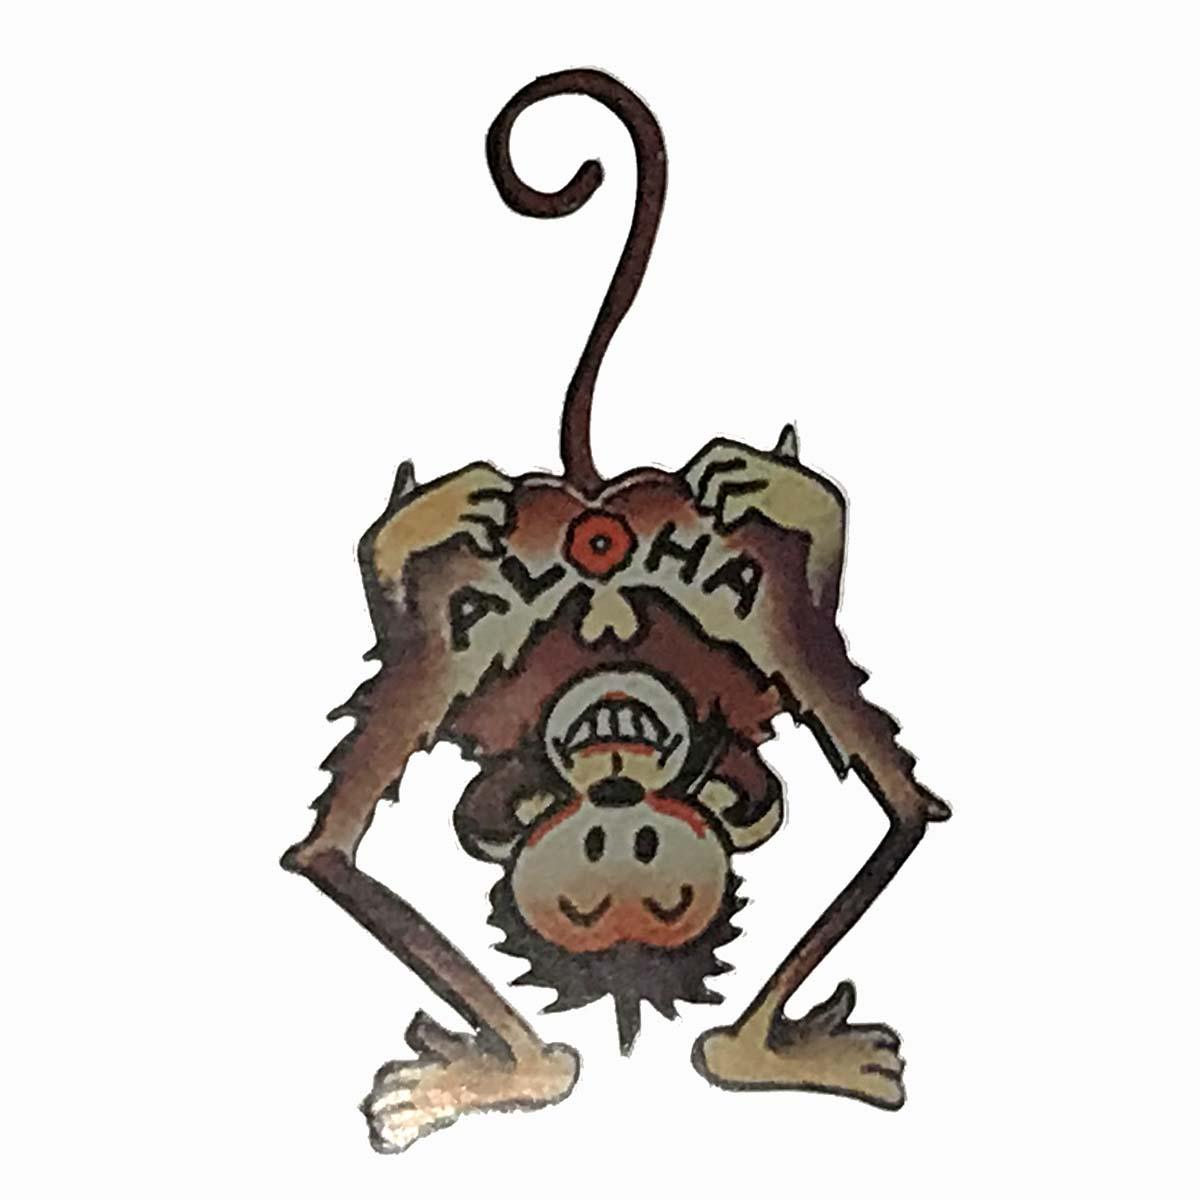 ALOHA - Monkey Balls Decal / Sticker!!